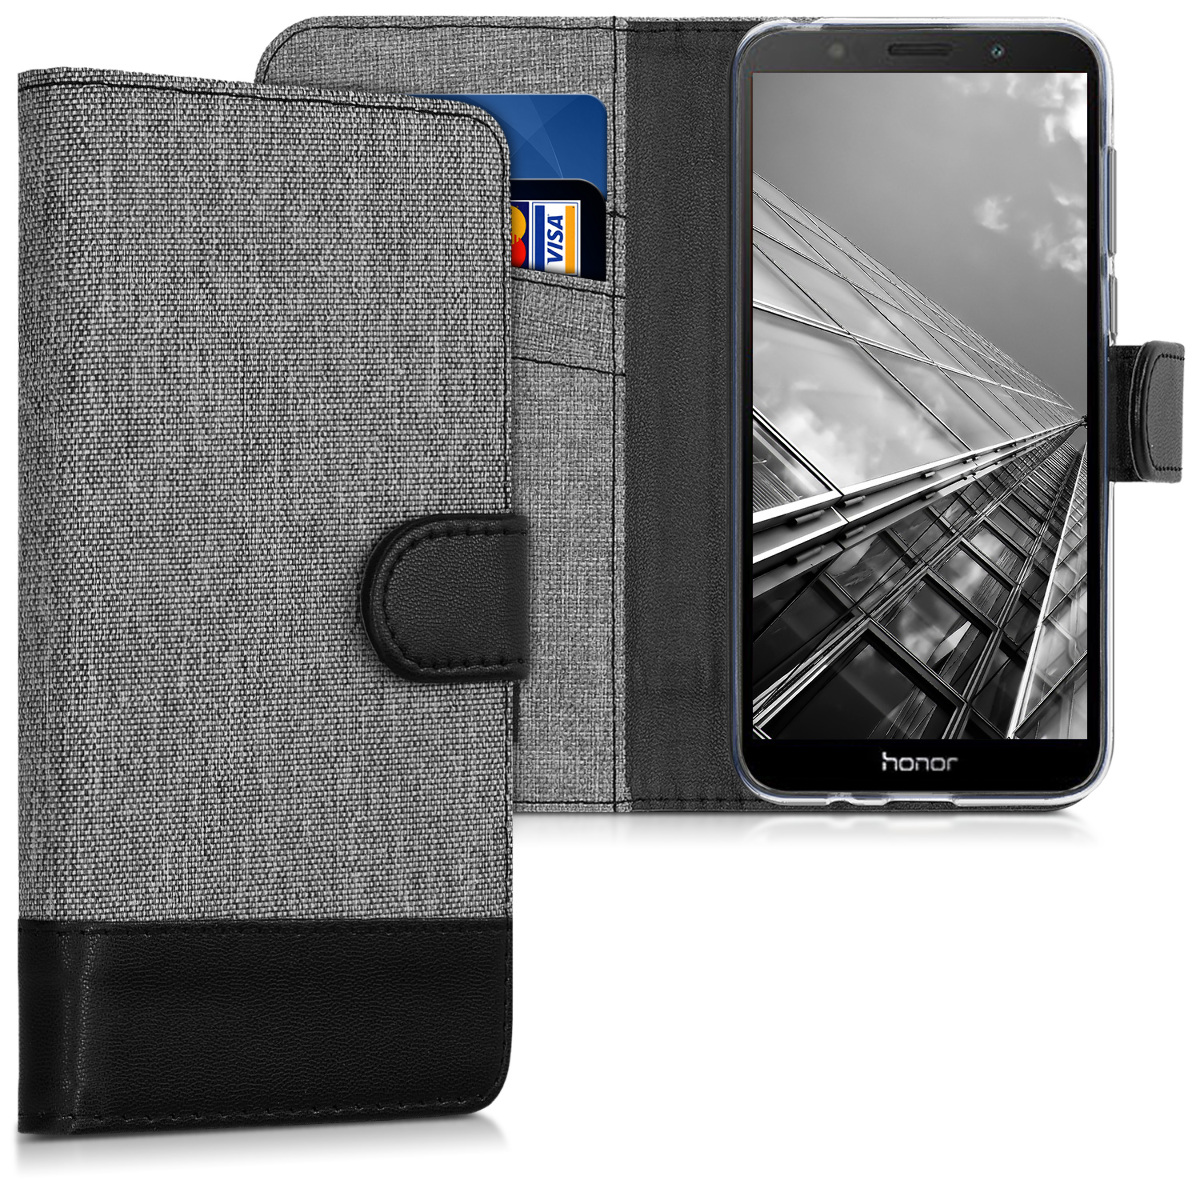 KW Θήκη - Πορτοφόλι Honor 7S - Grey / Black Canvas (46903.01)